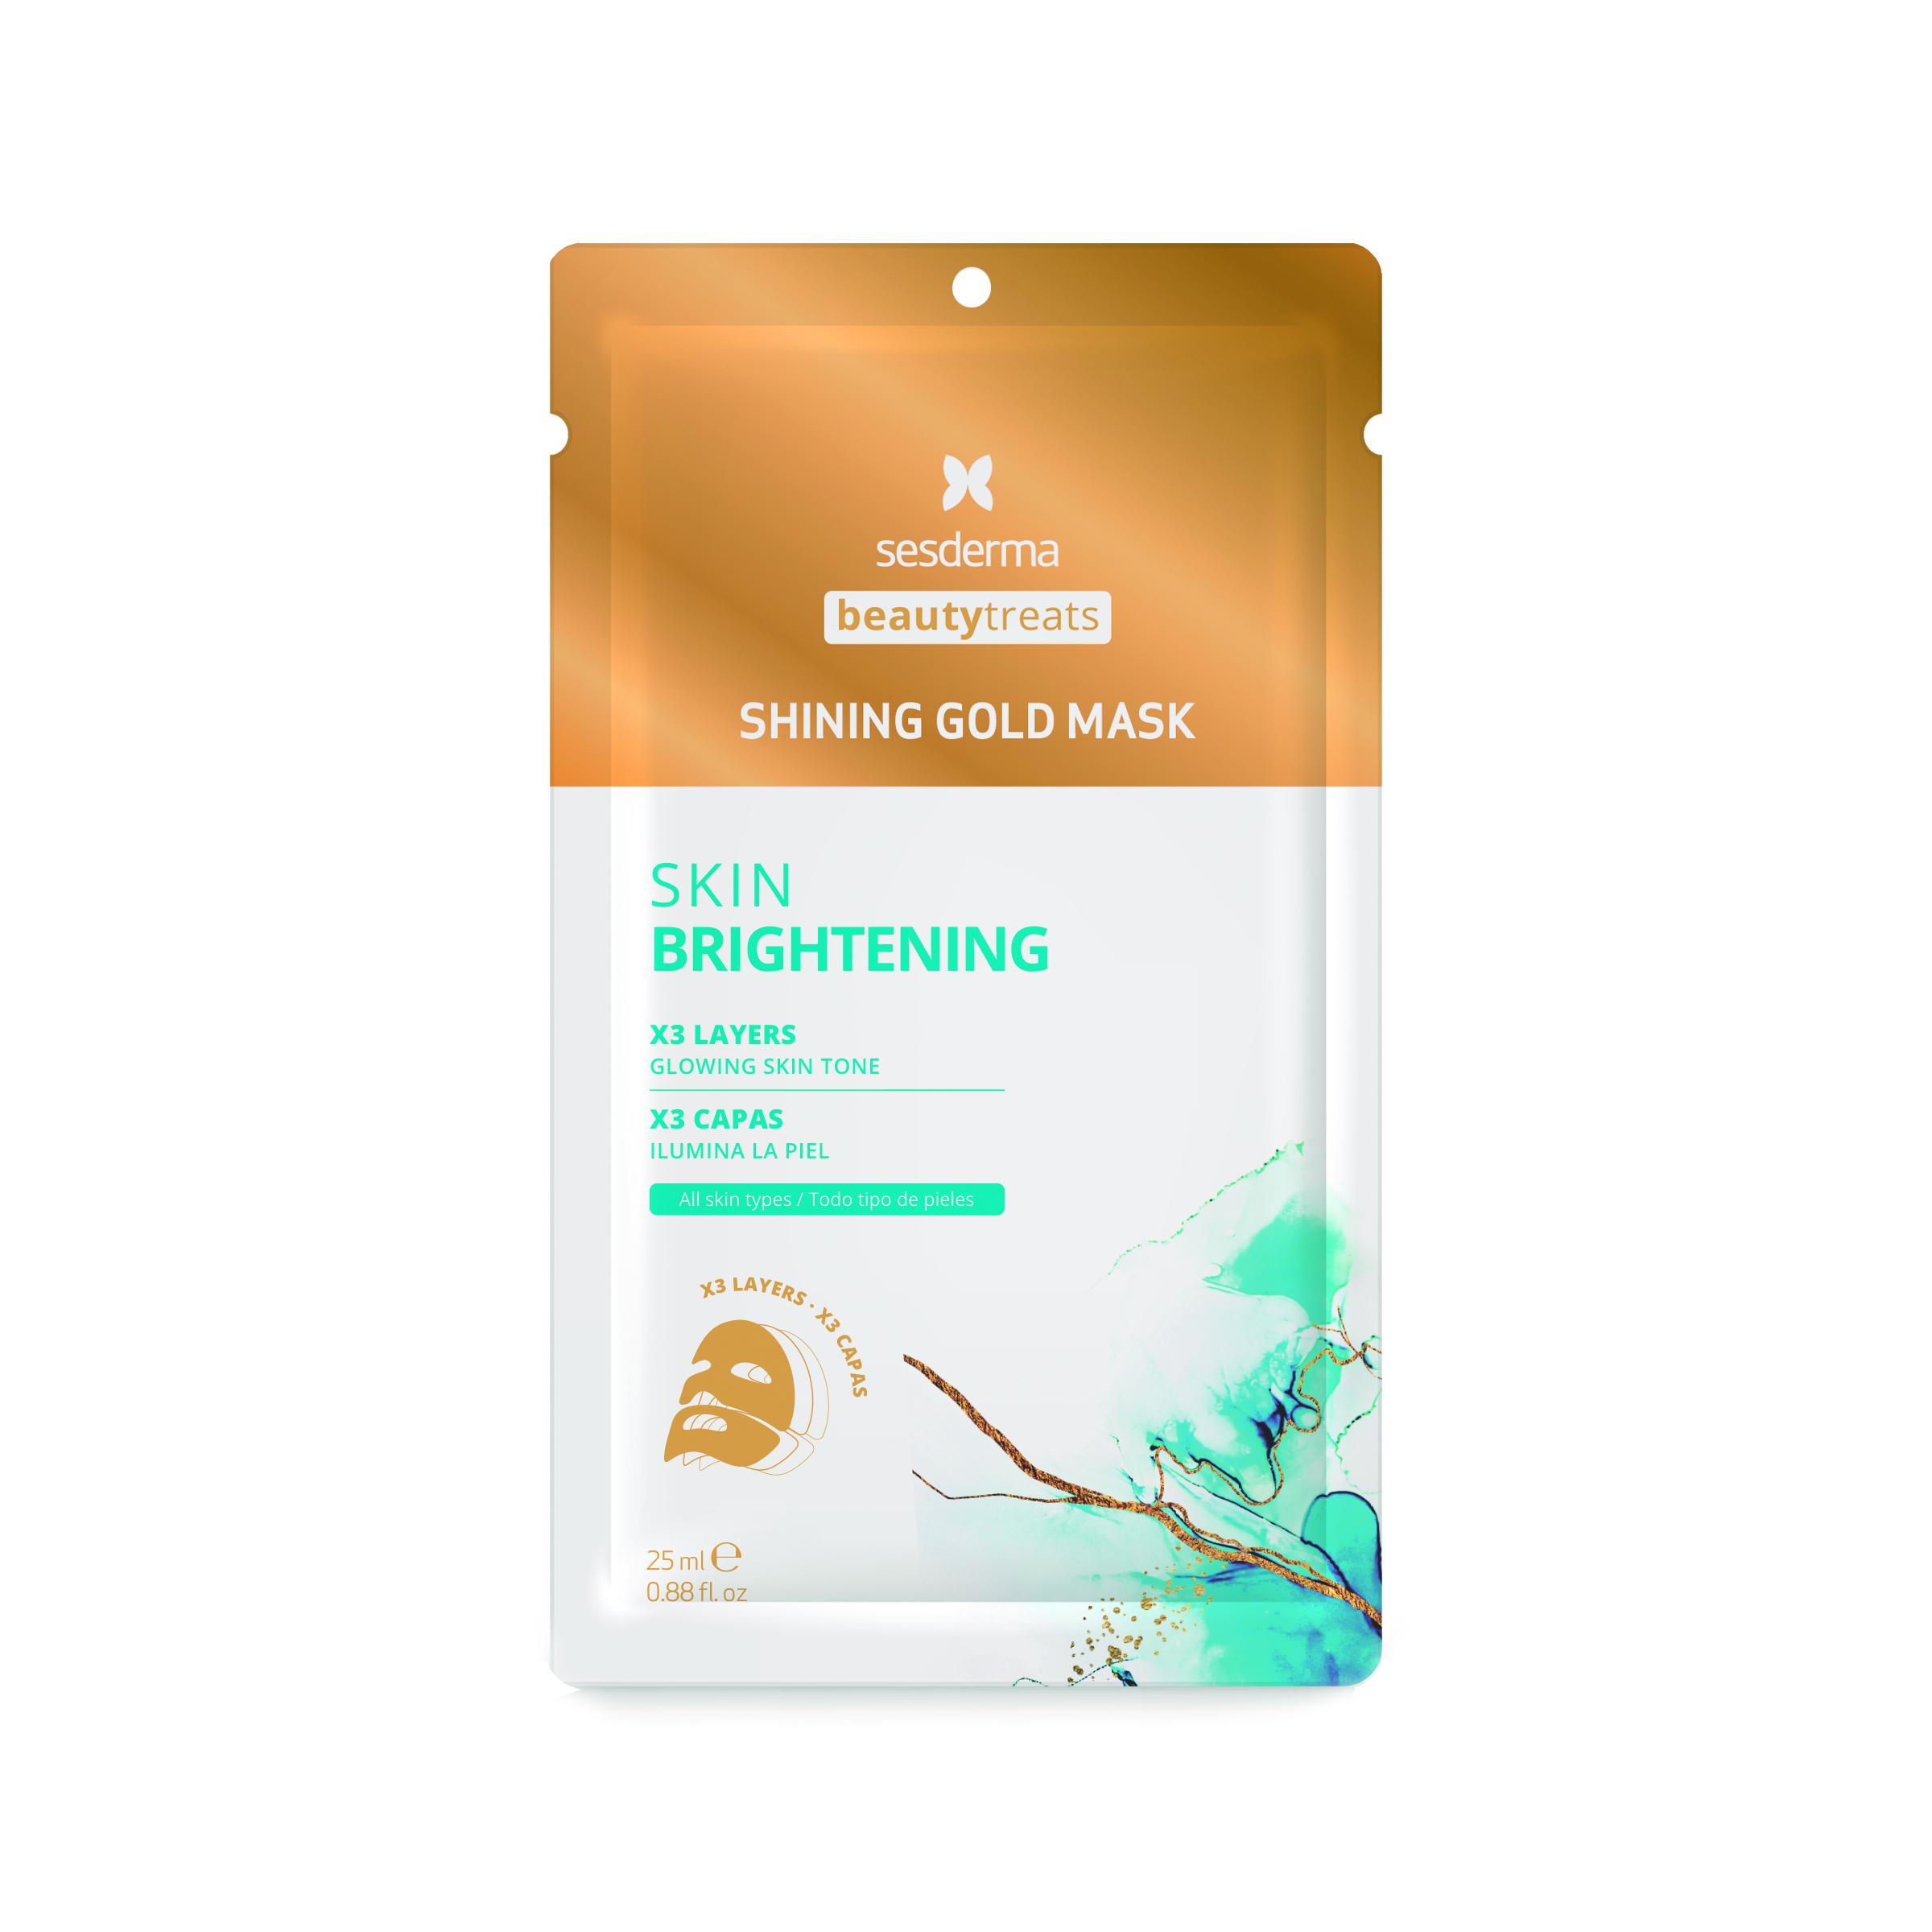 Sesderma Beauty Treats Shining Gold Mask  Mascarilla facial iluminadora y antioxidante 25 ml